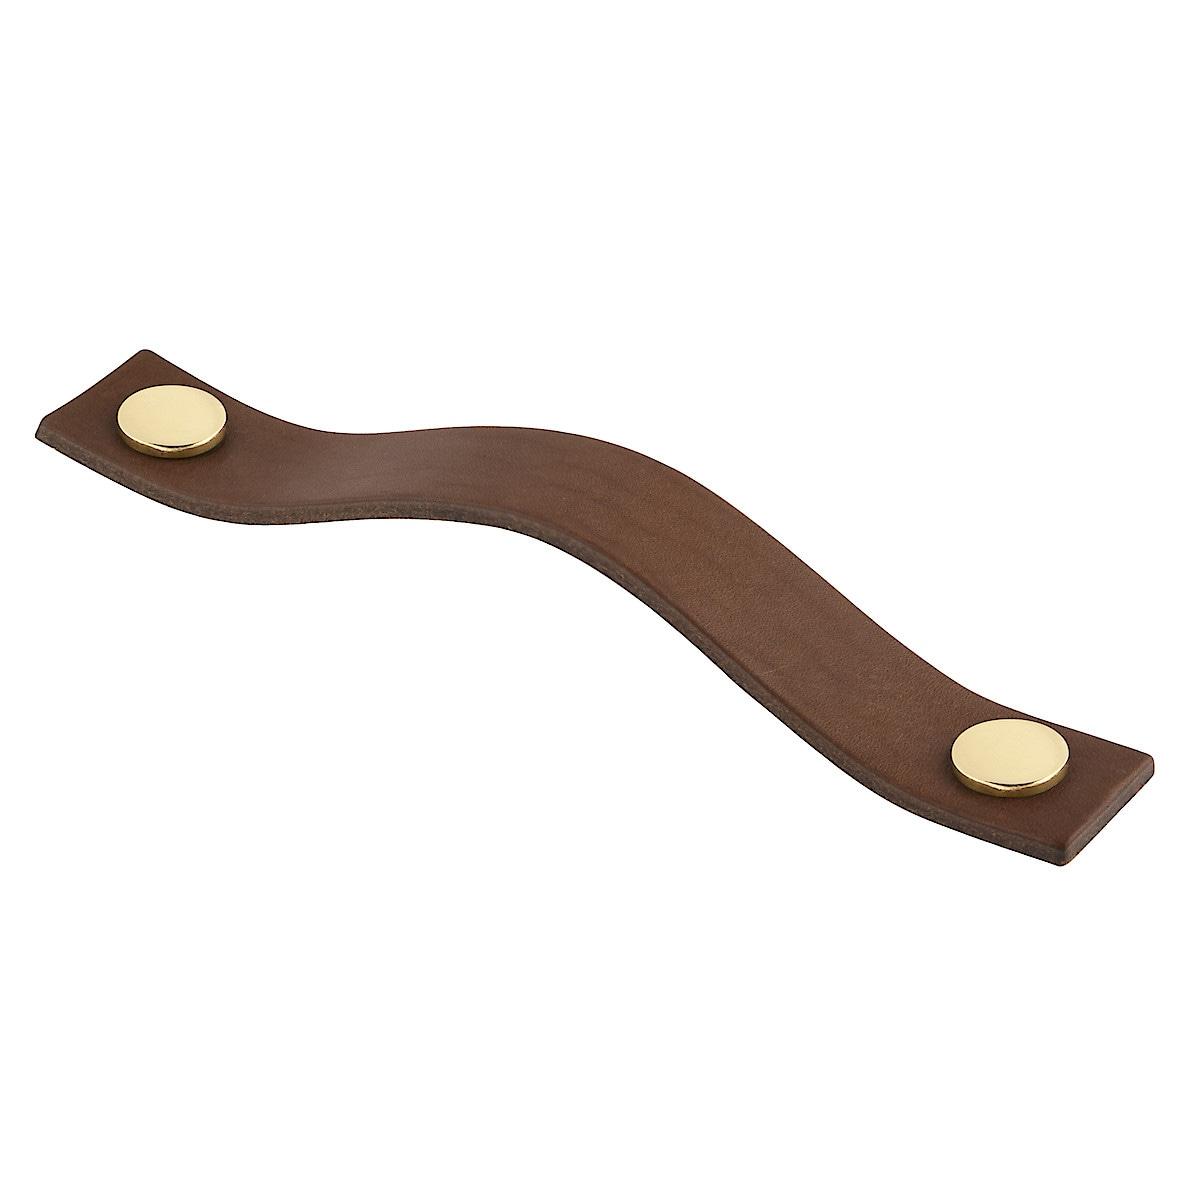 Läderhandtag Levanto brunt, 158 mm